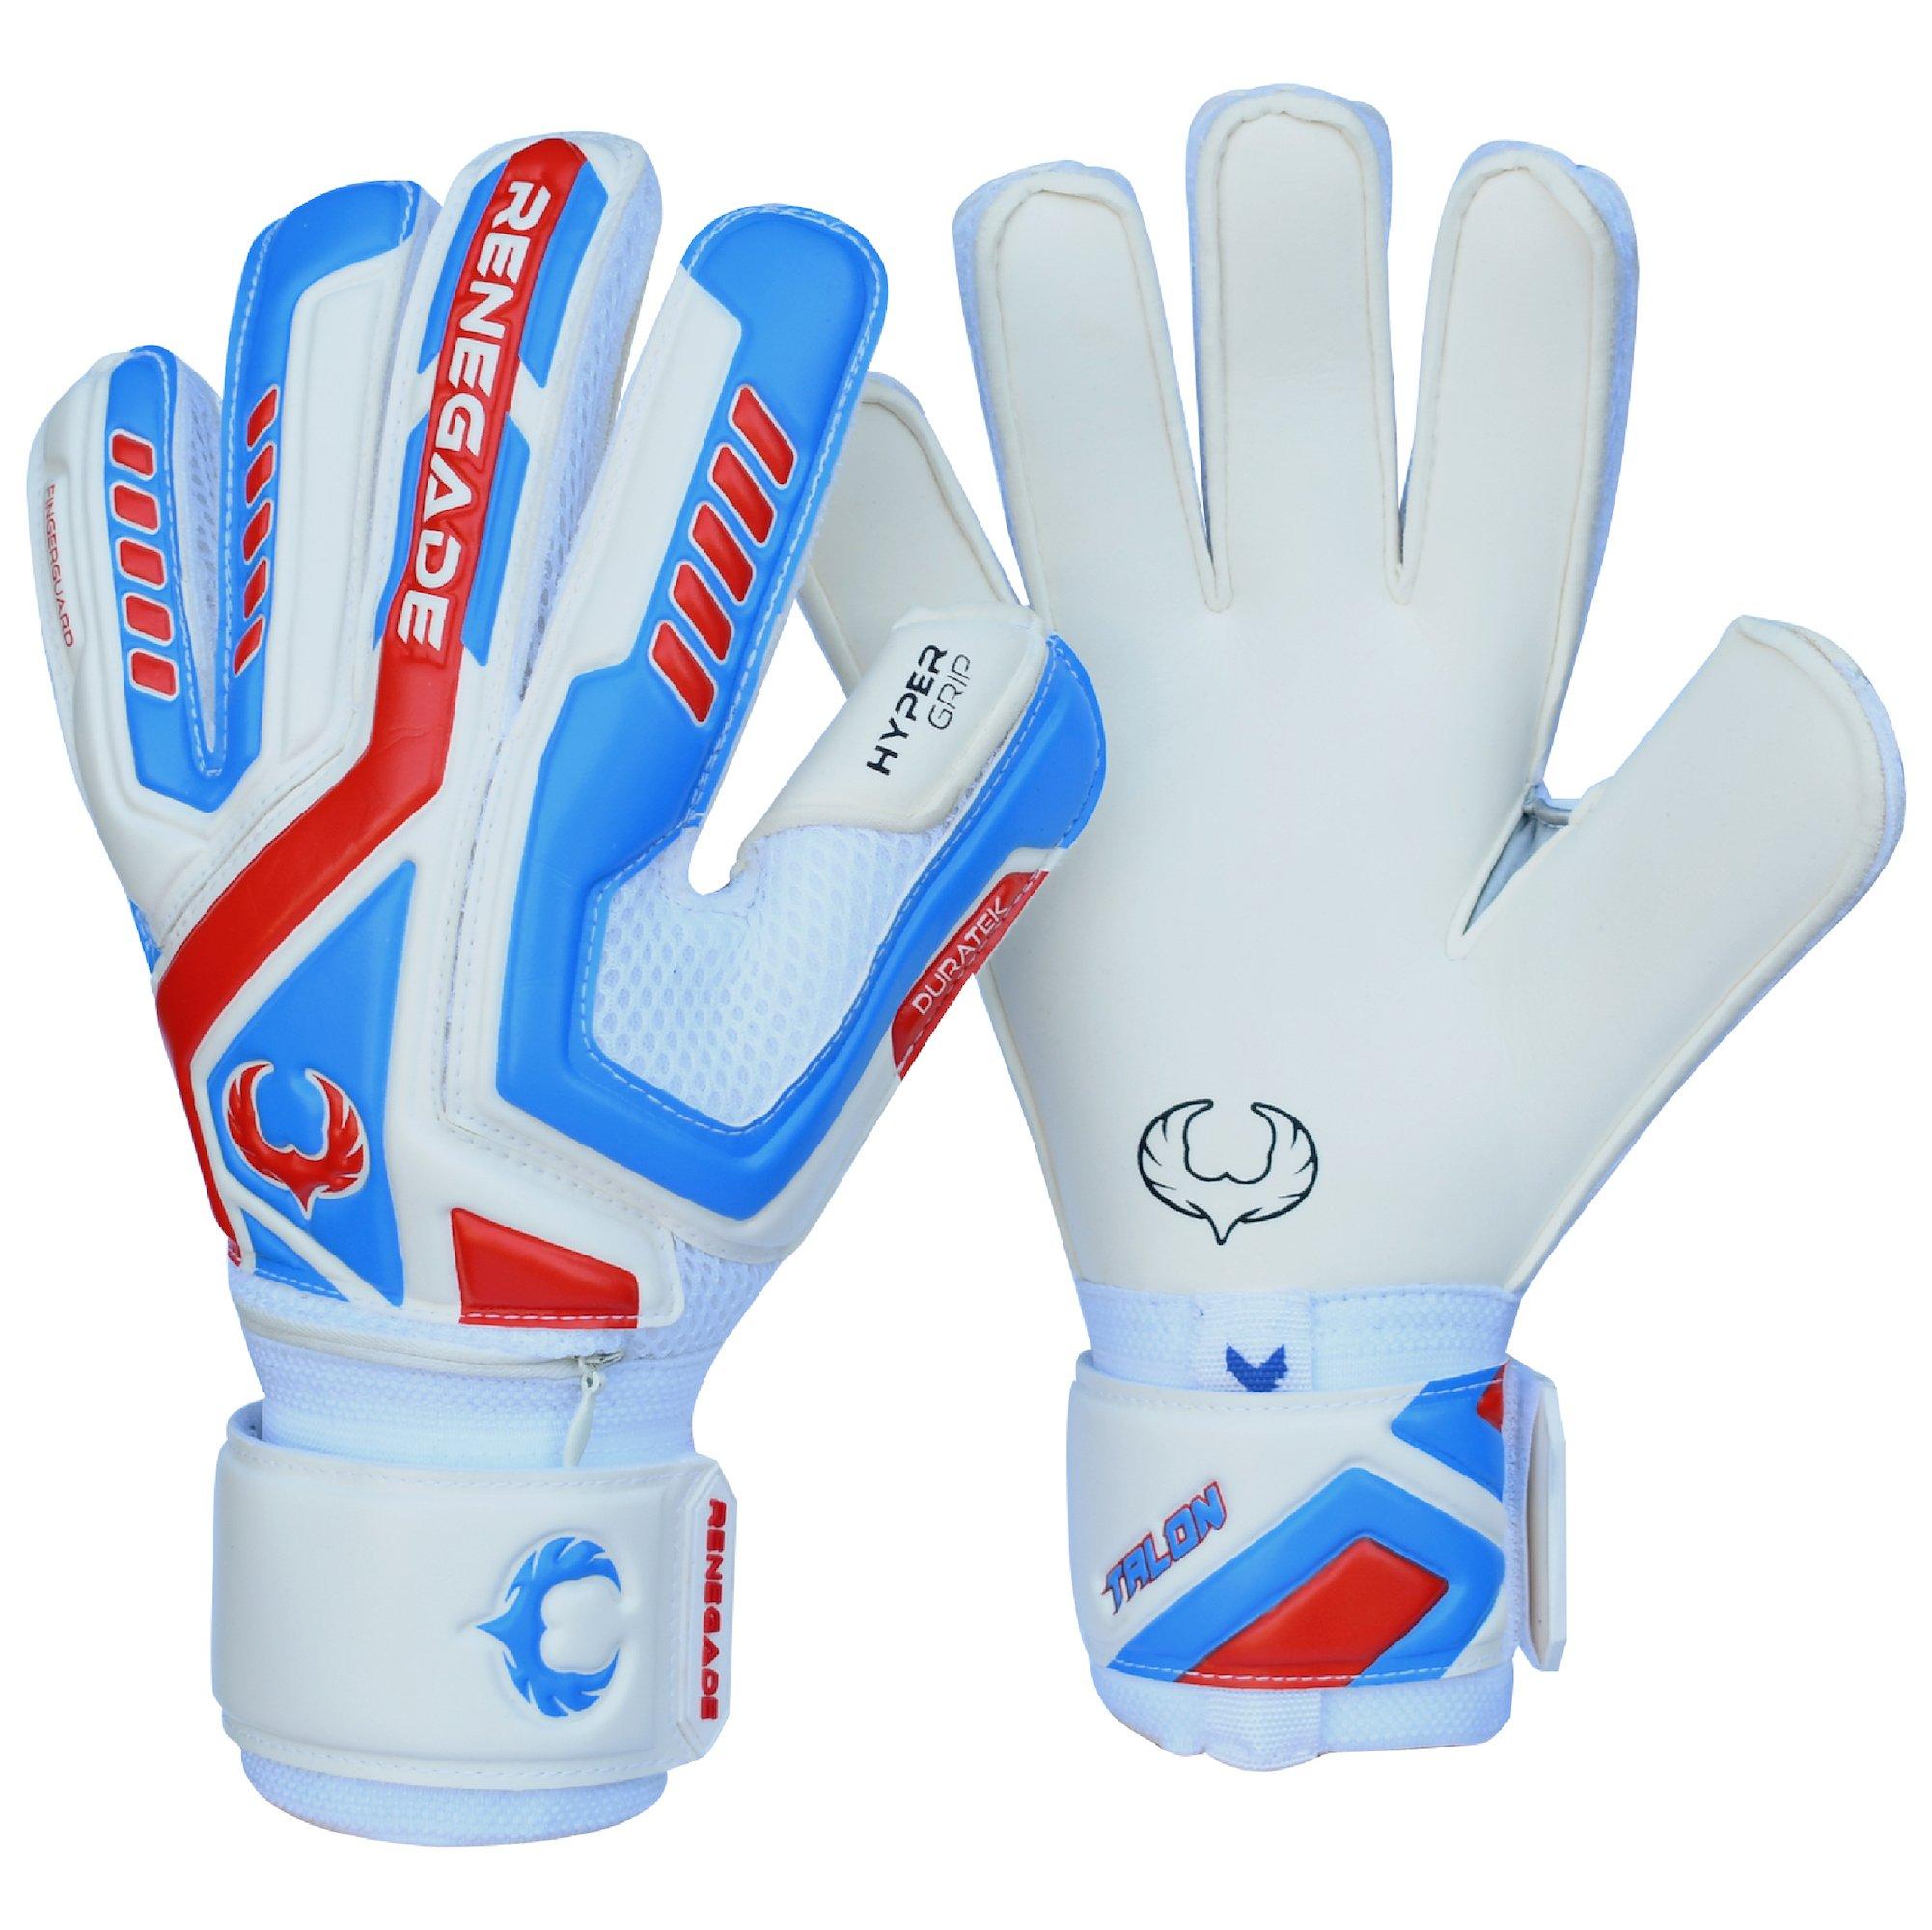 e461cf0e6 Renegade GK Talon Mirage Flat Cut Level 2 Goalie Gloves Finger Protection  Pro-Tek Savers - Youth & Adult Soccer Gloves Goalkeeper Size 9 -  Outdoor/Indoor ...